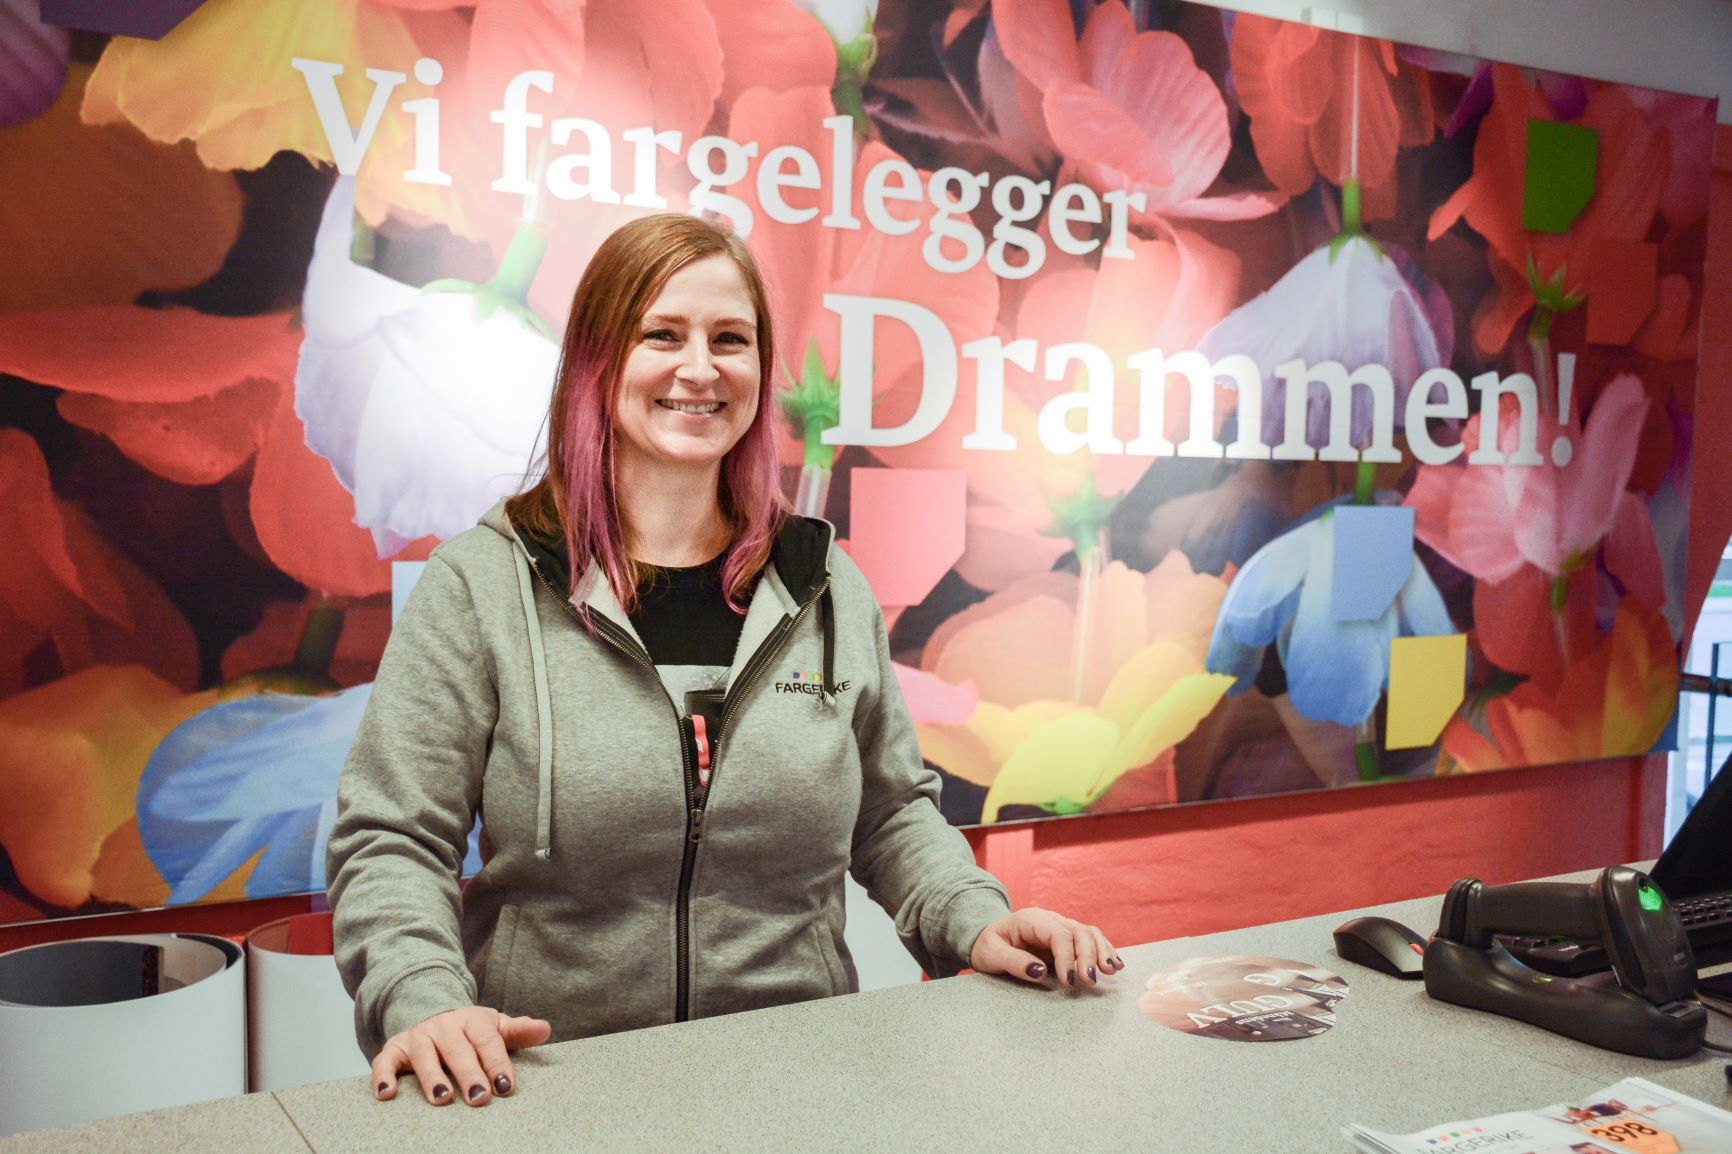 Lothe Motzfeldt fargelegger Drammen